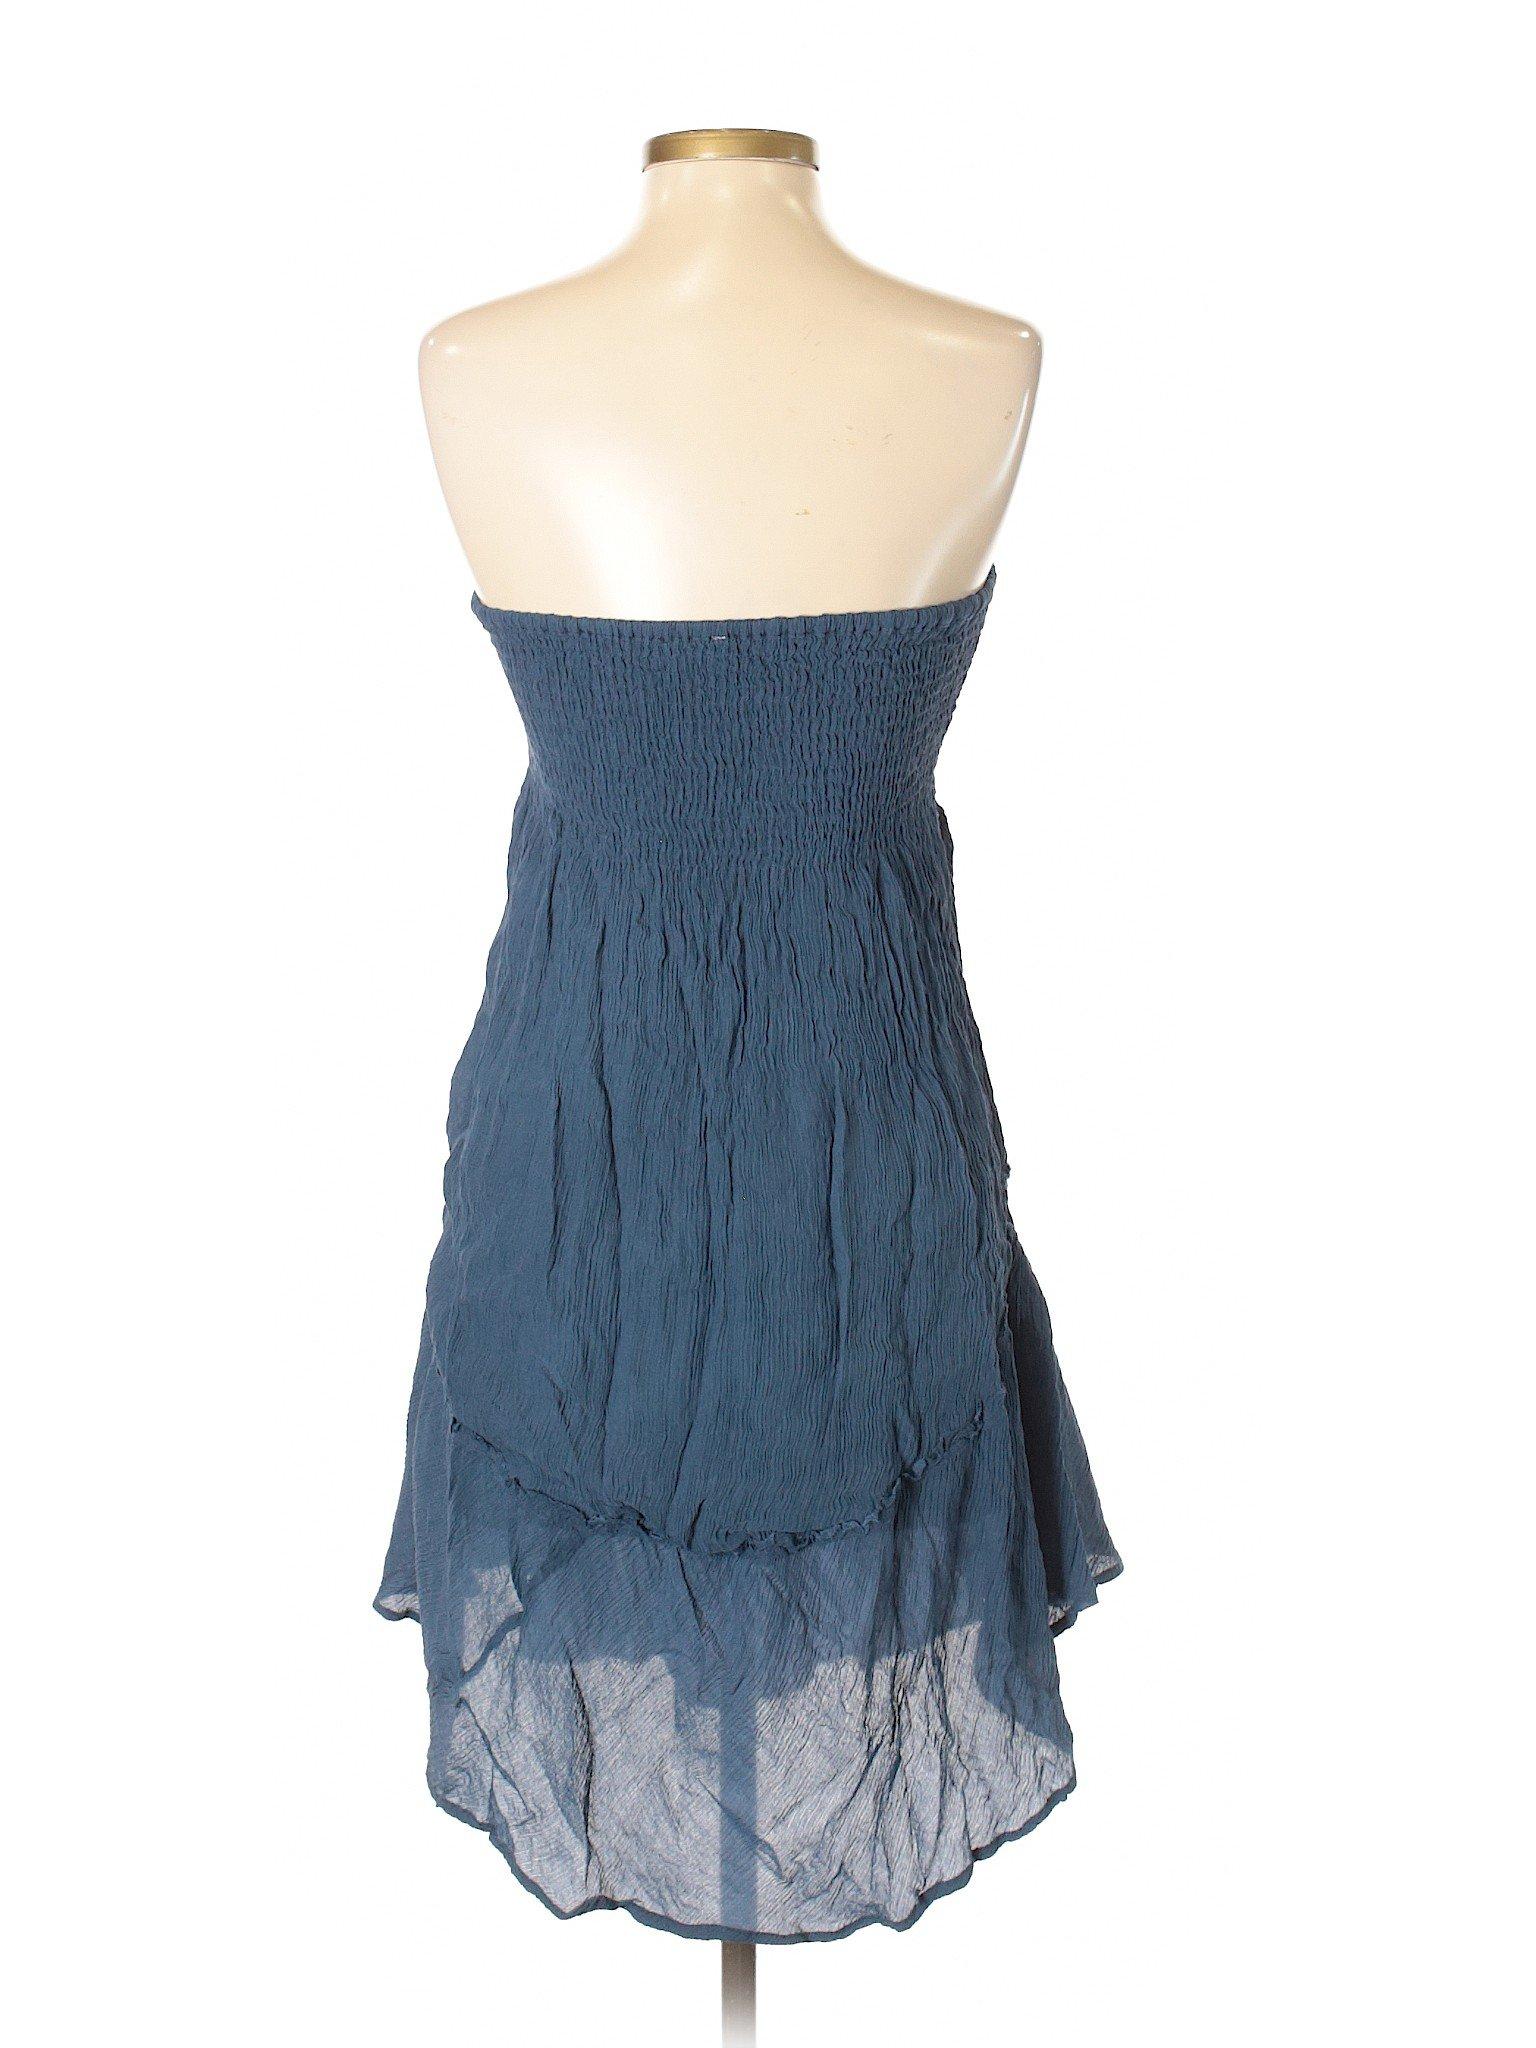 winter Casual Dress Calypso St Barth Boutique dcWBqRwd